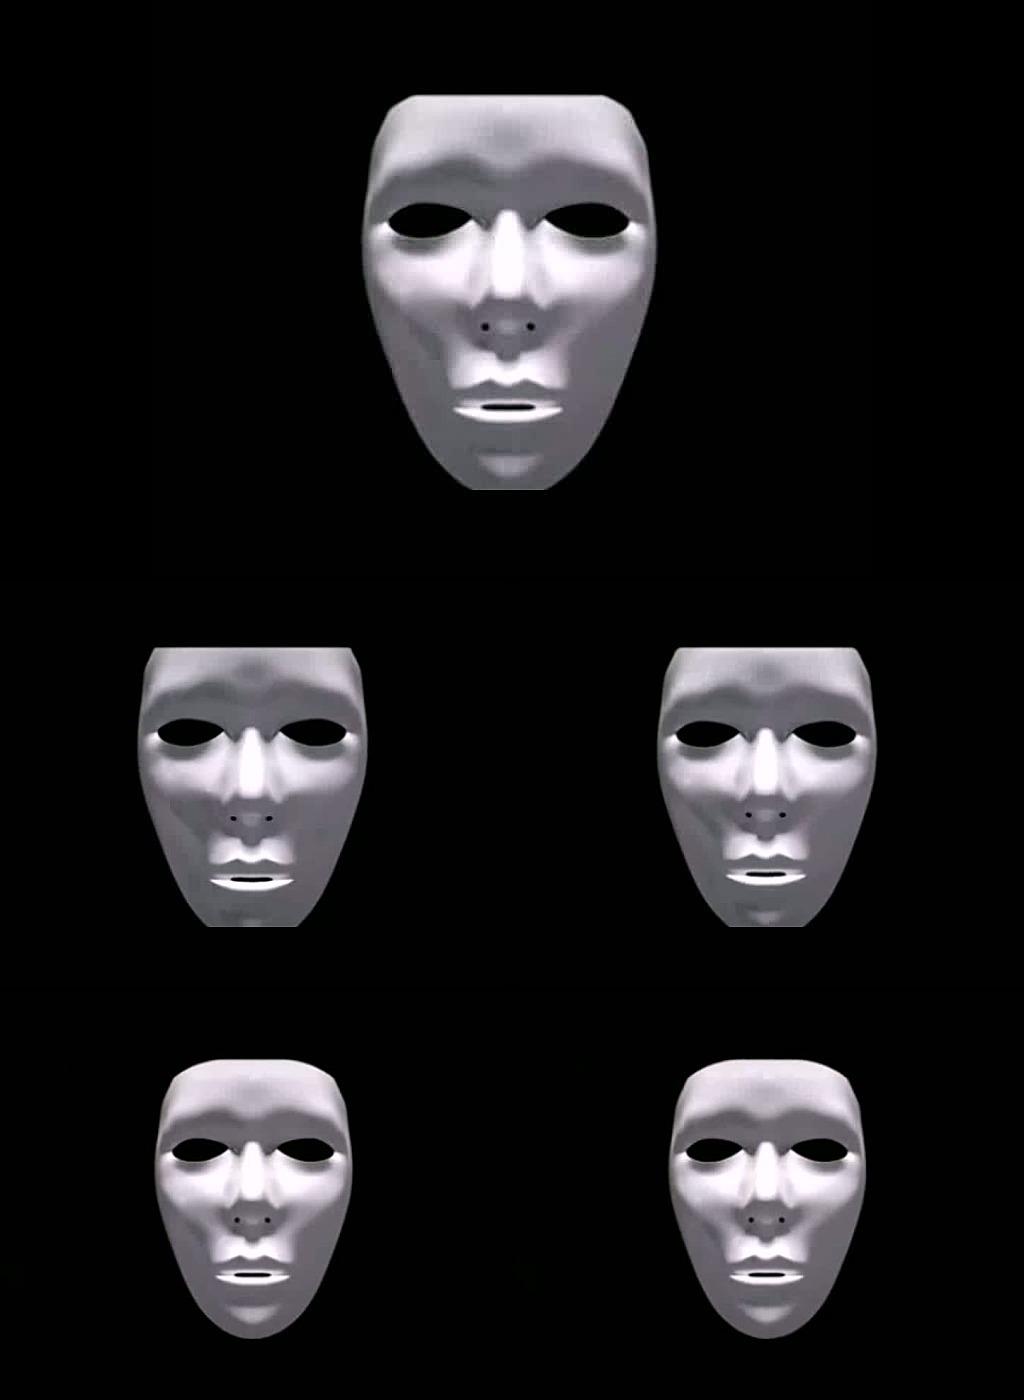 3d动感头像模板下载 3d动感头像图片下载